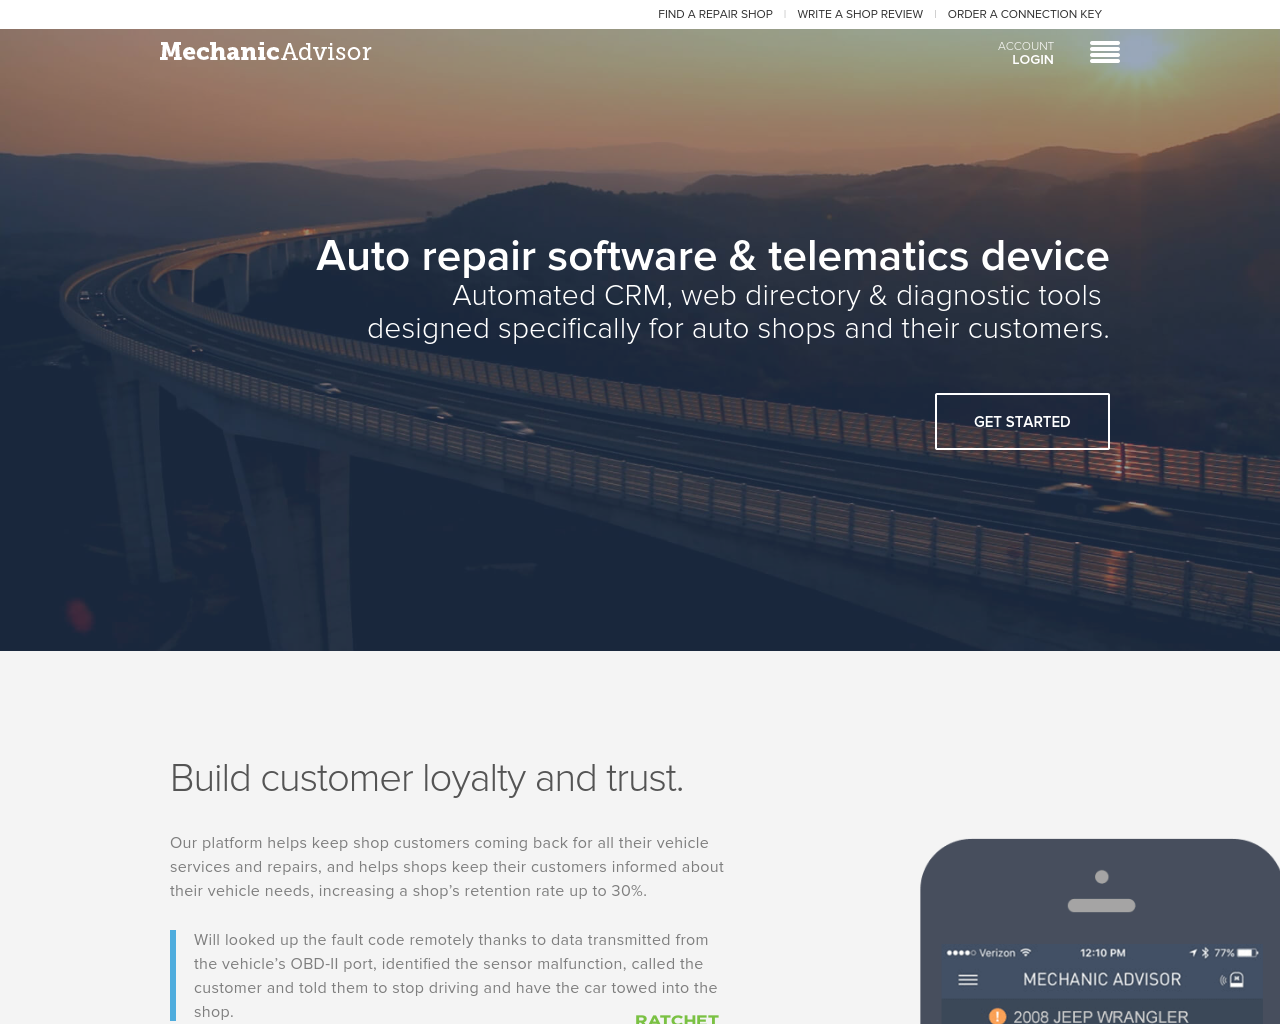 Mechanic-Advisor-Advertising-Reviews-Pricing